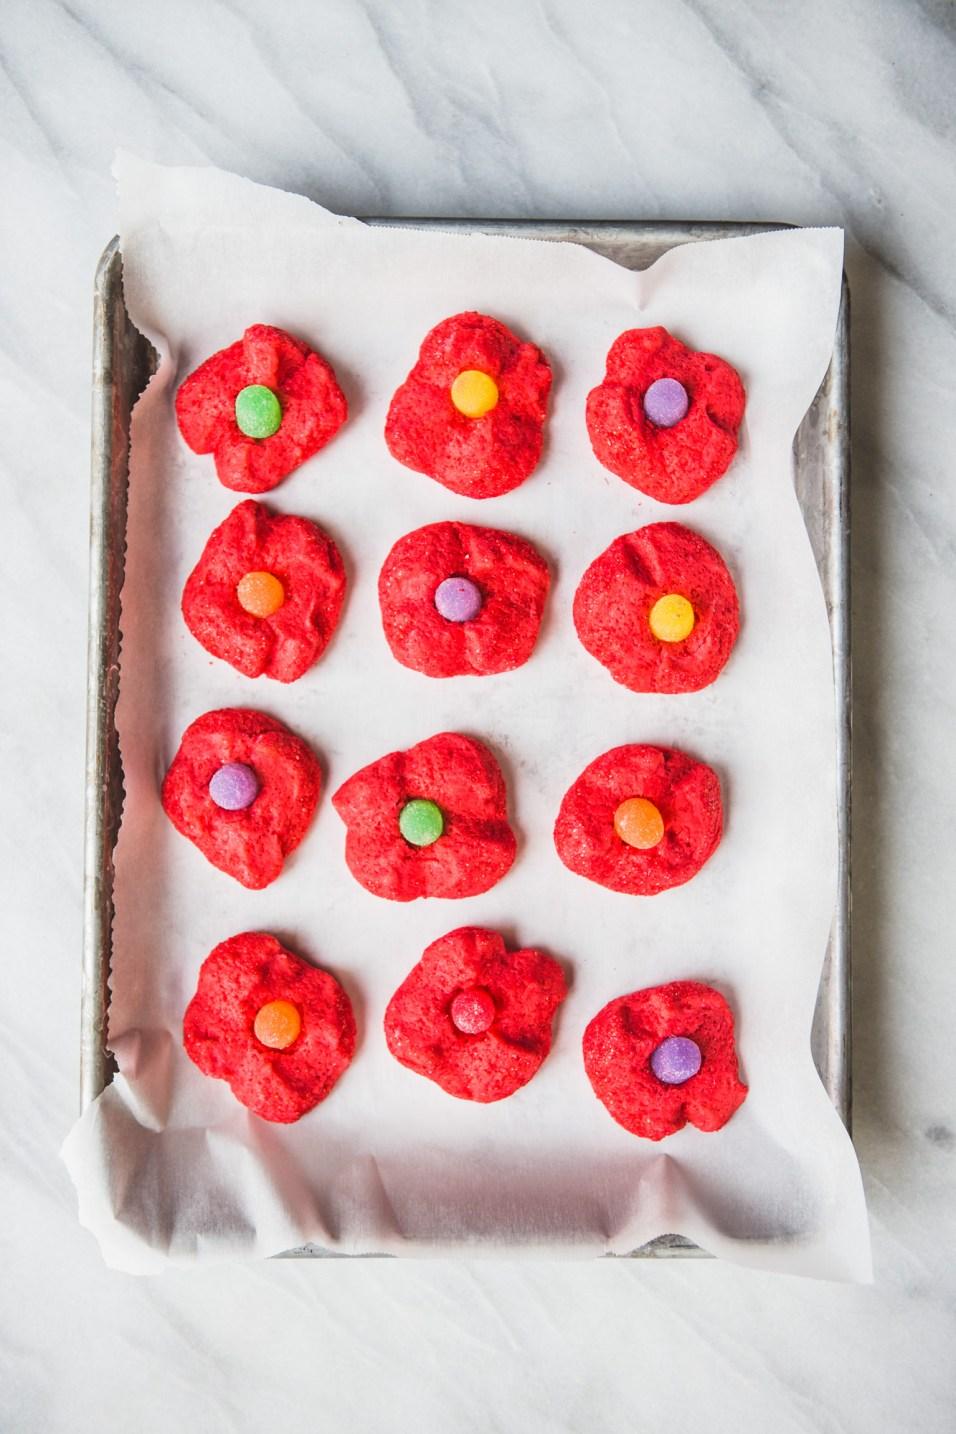 heinens_christmas_cookies_tableanddish-7561